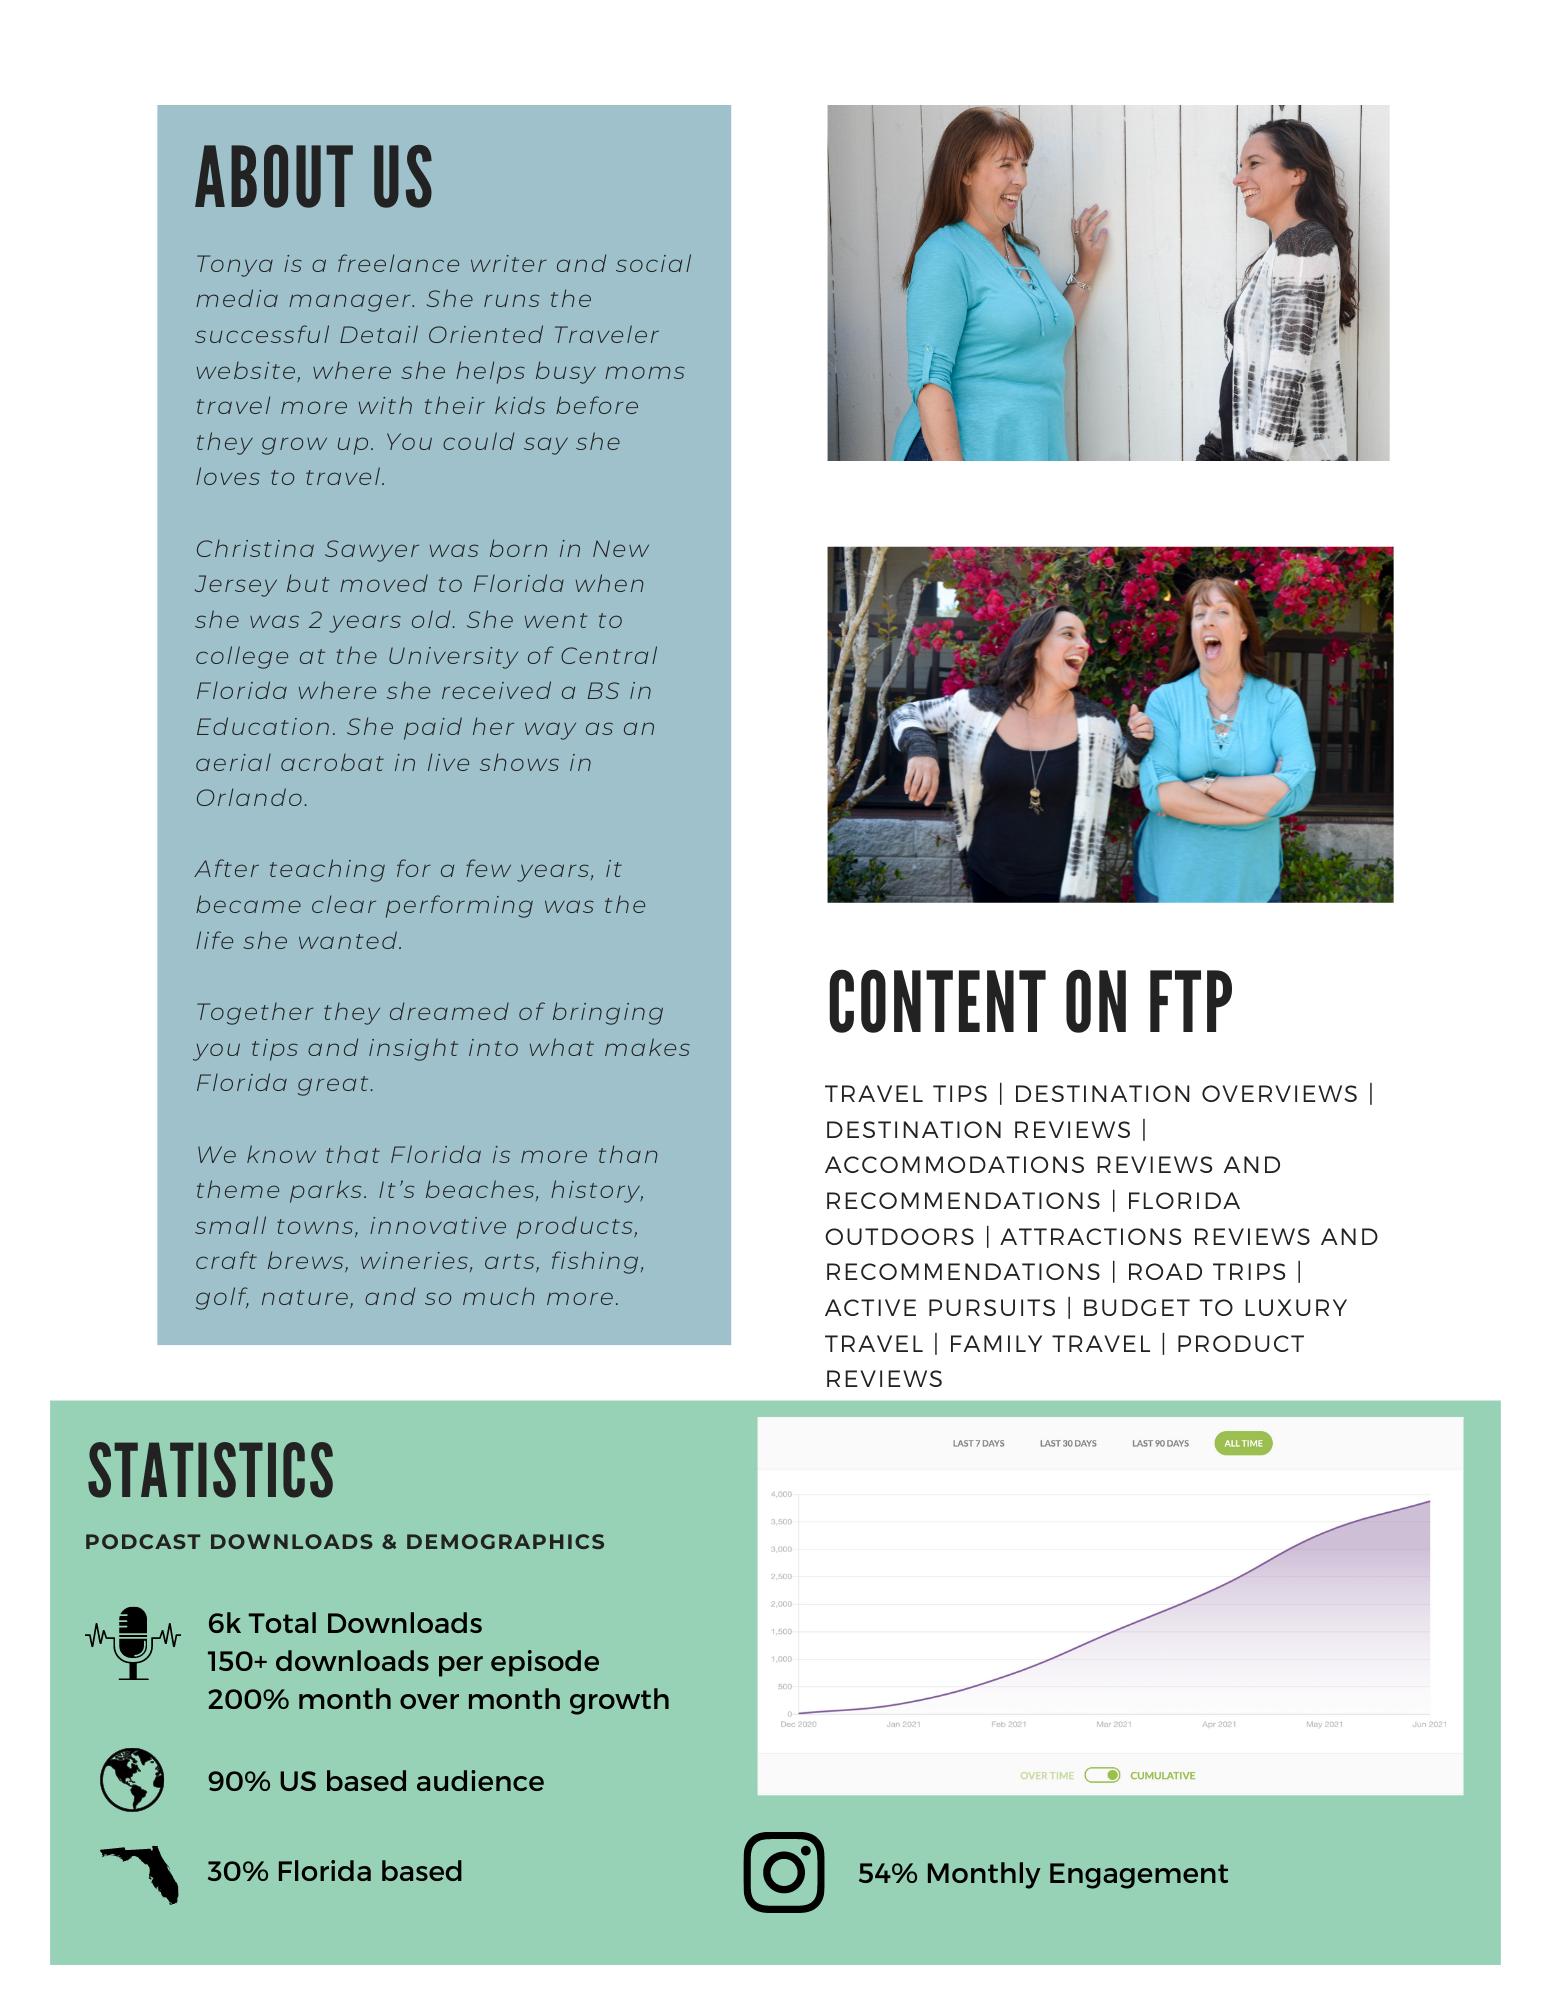 FTP Media Kit 2 - updated August 21